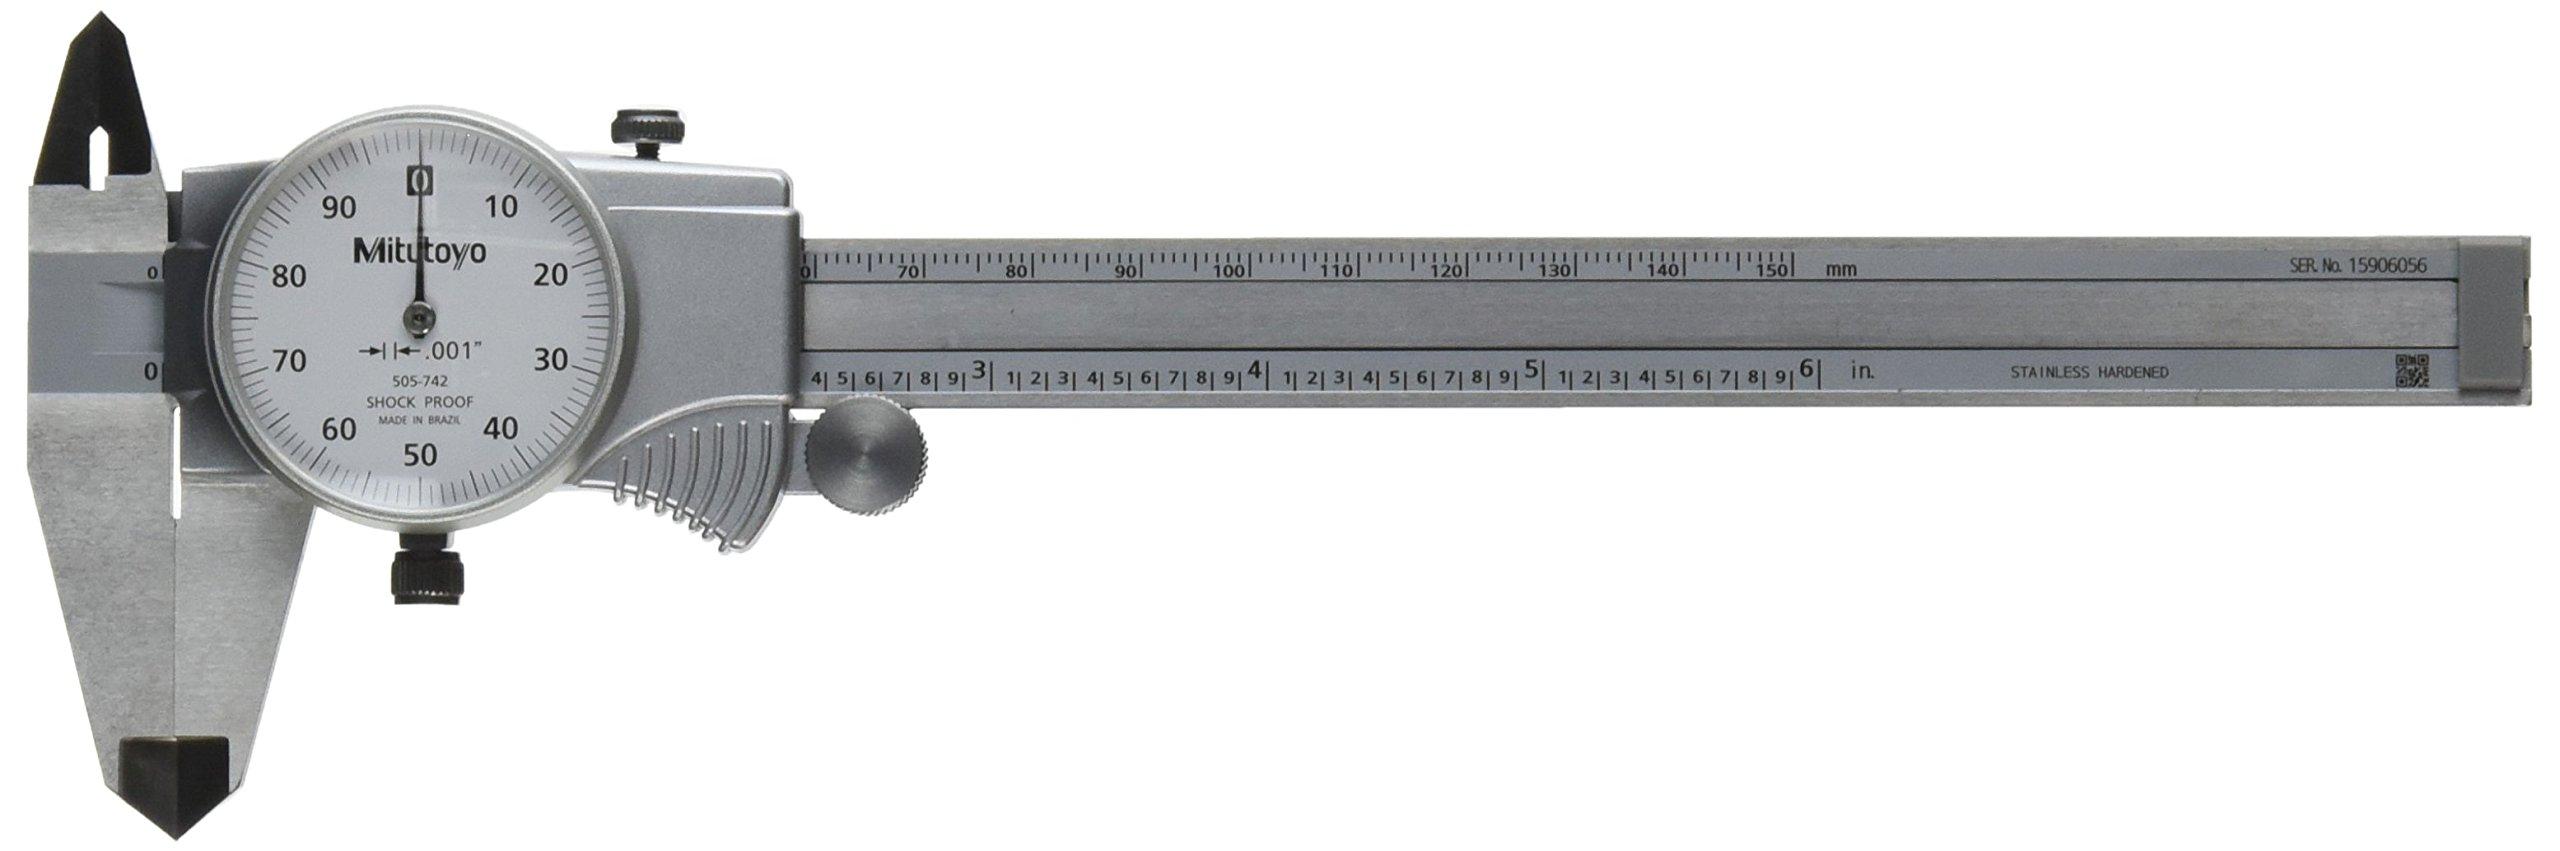 Mitutoyo 505-742 Dial Caliper, 0.1'' per Rev, 0-6'' Range, 0.001'' Accuracy